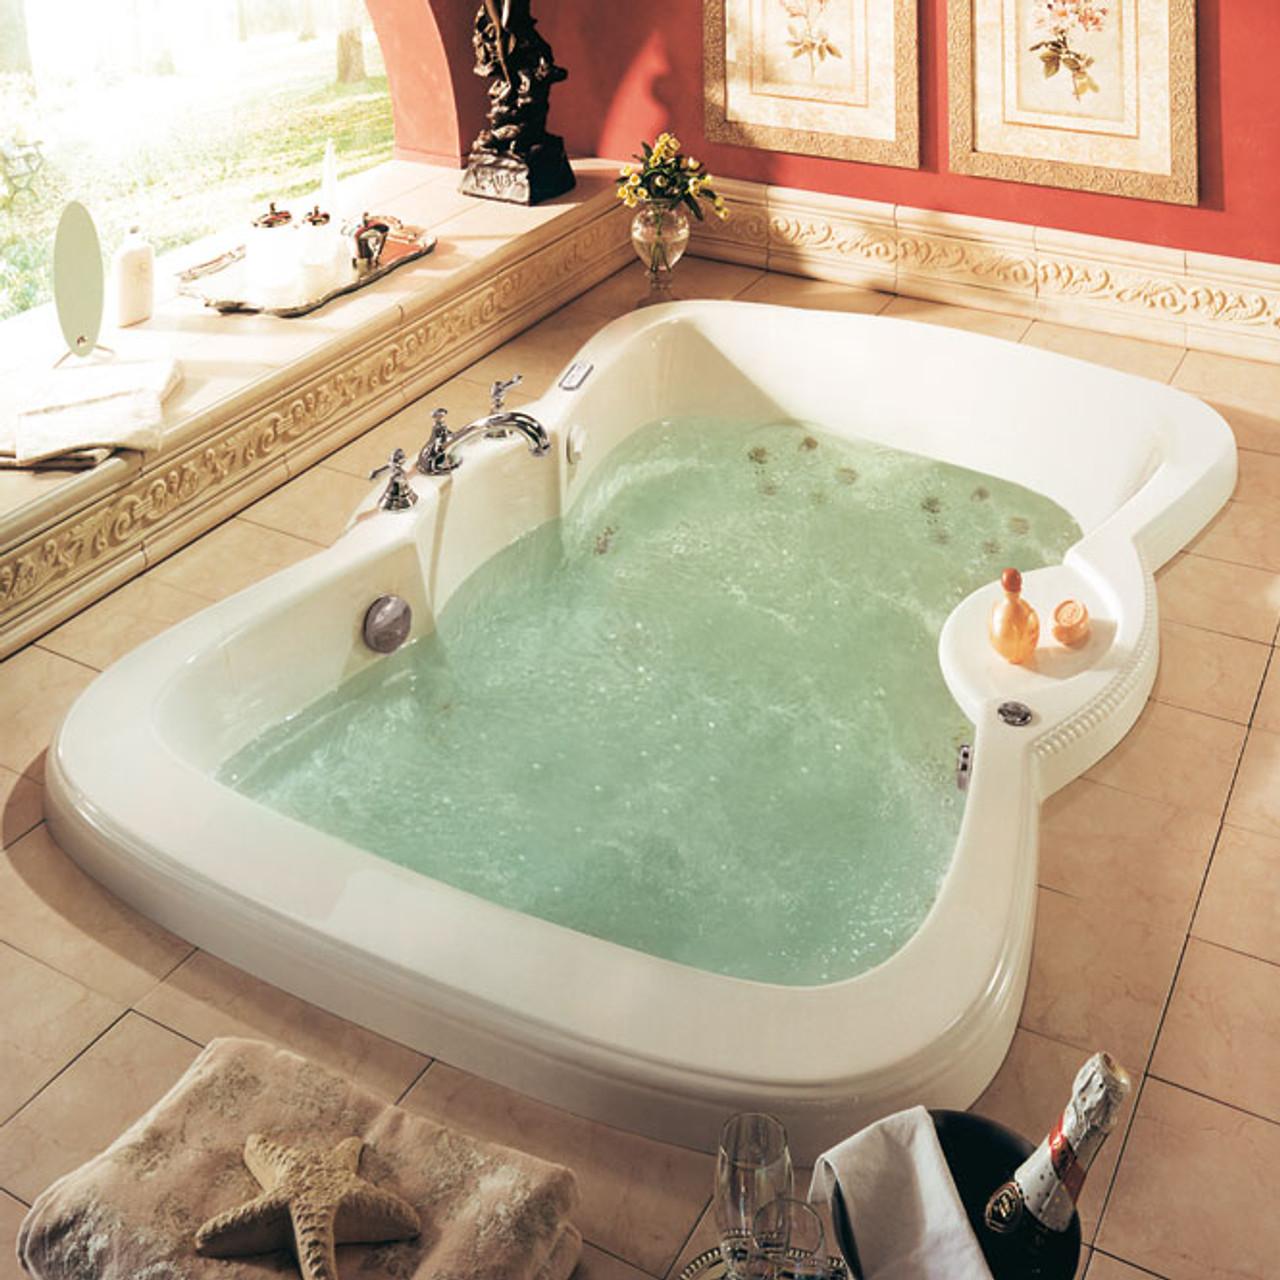 Neptune Cleopatra Drop in Bathing Bath Tub 76 x 76 - York Taps